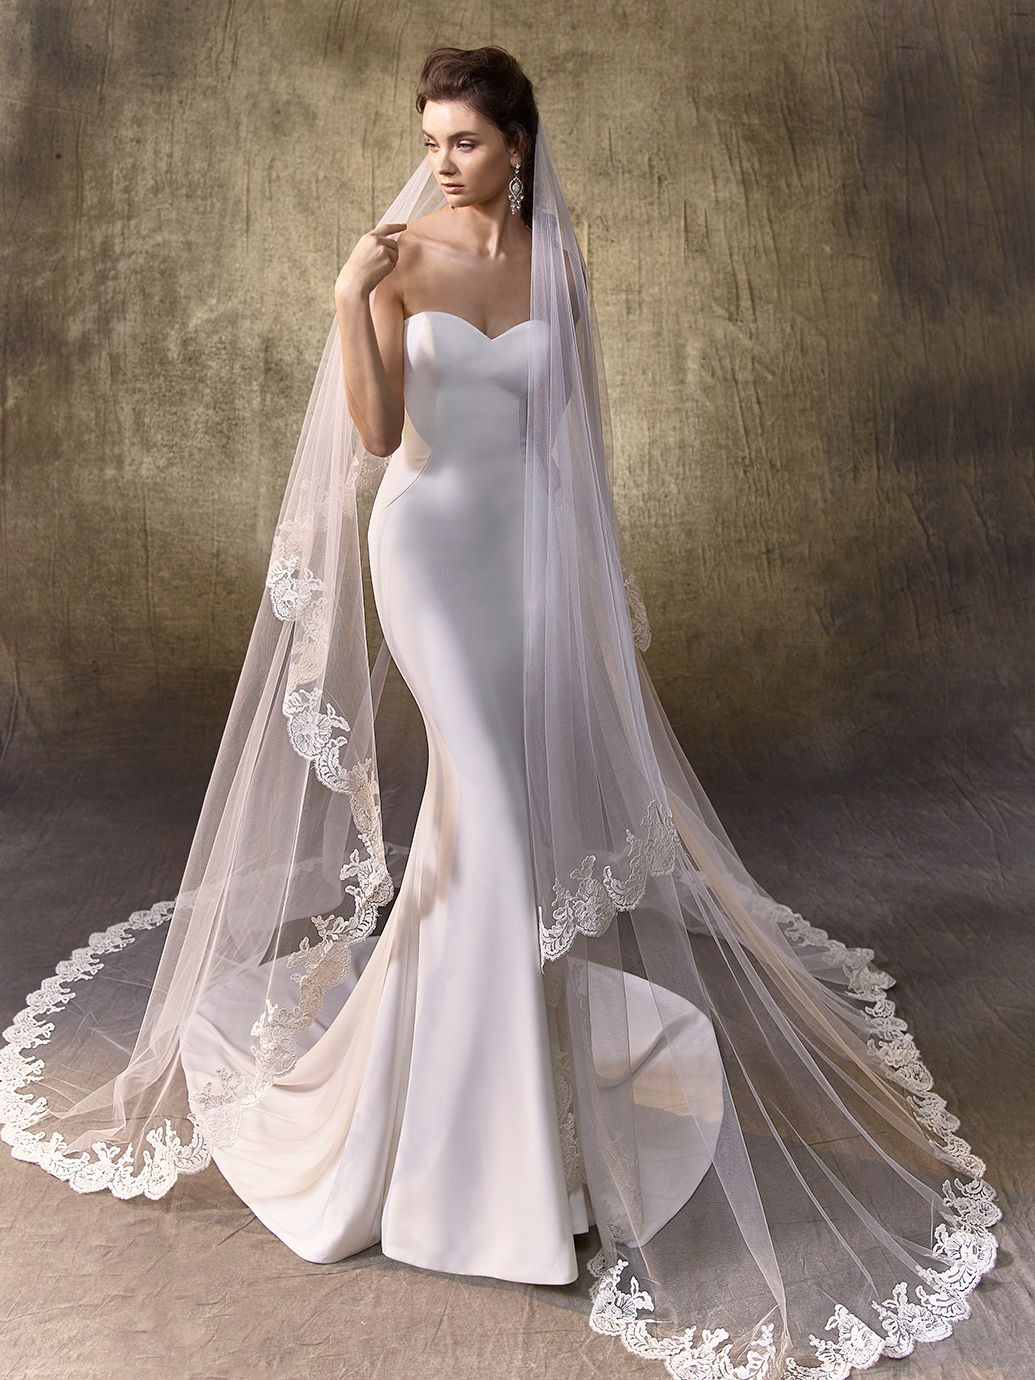 enzoani logan wedding dress alternative to dakota dress by